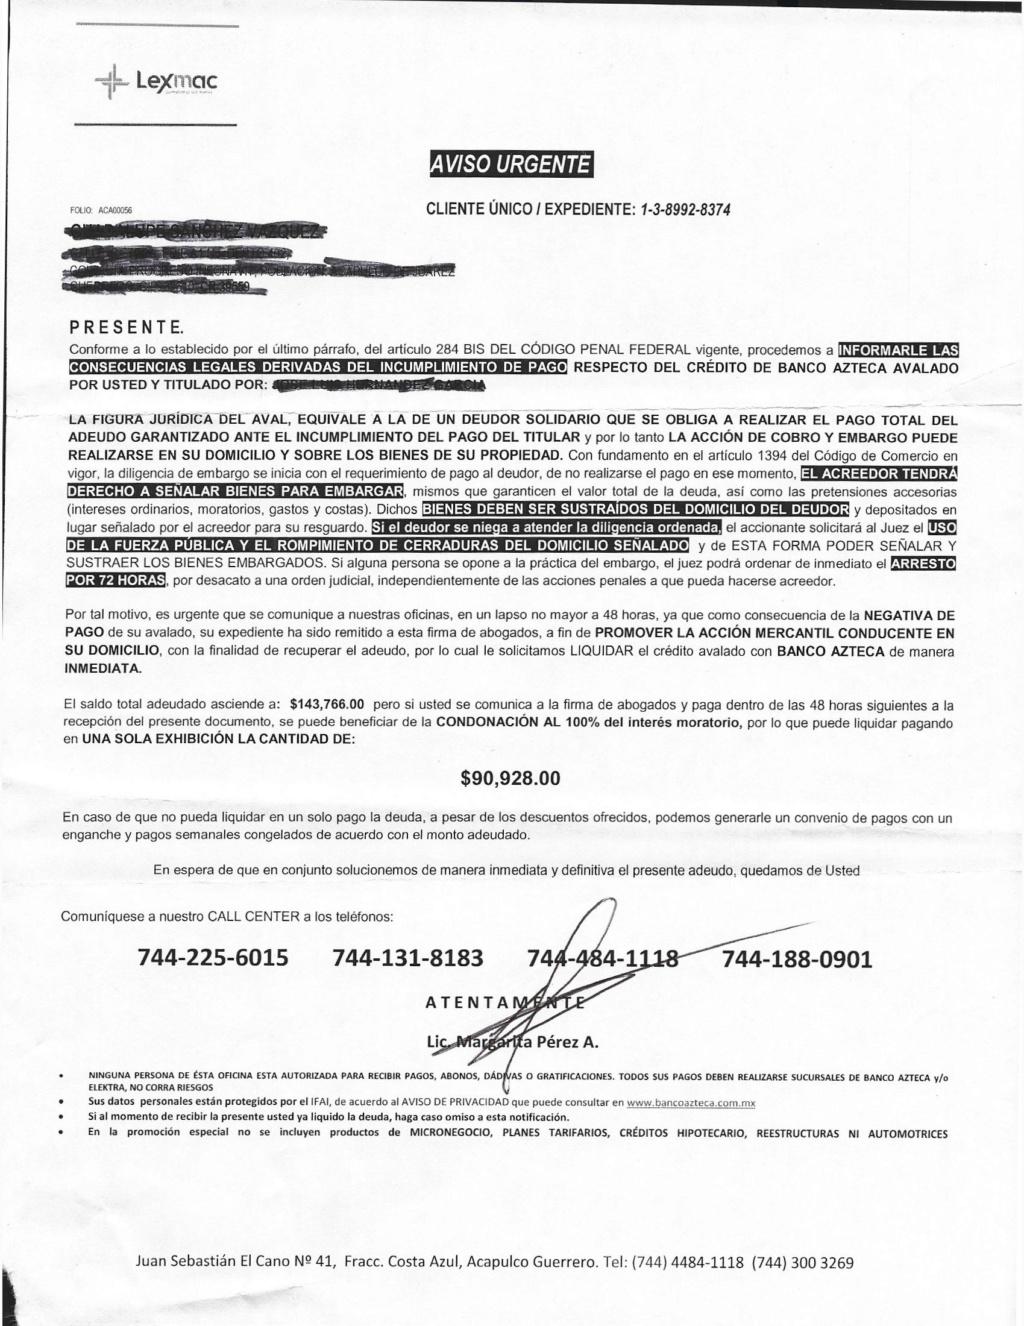 adjunto documento Scan511